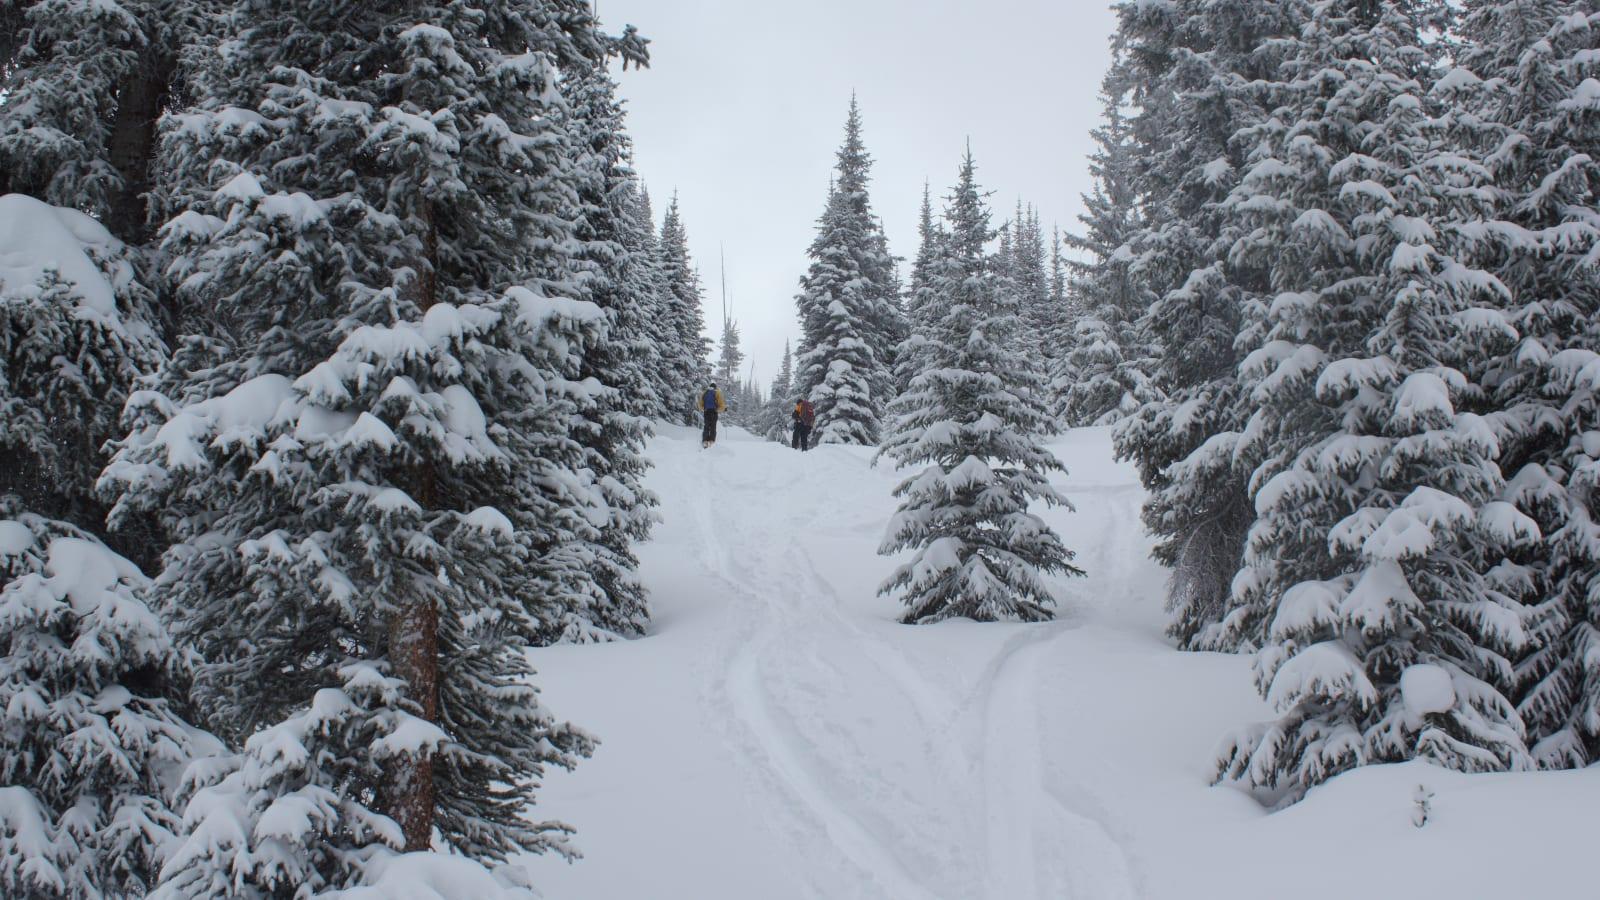 Colorado Backcountry Tree Skiing Peter Estin Hut Basalt